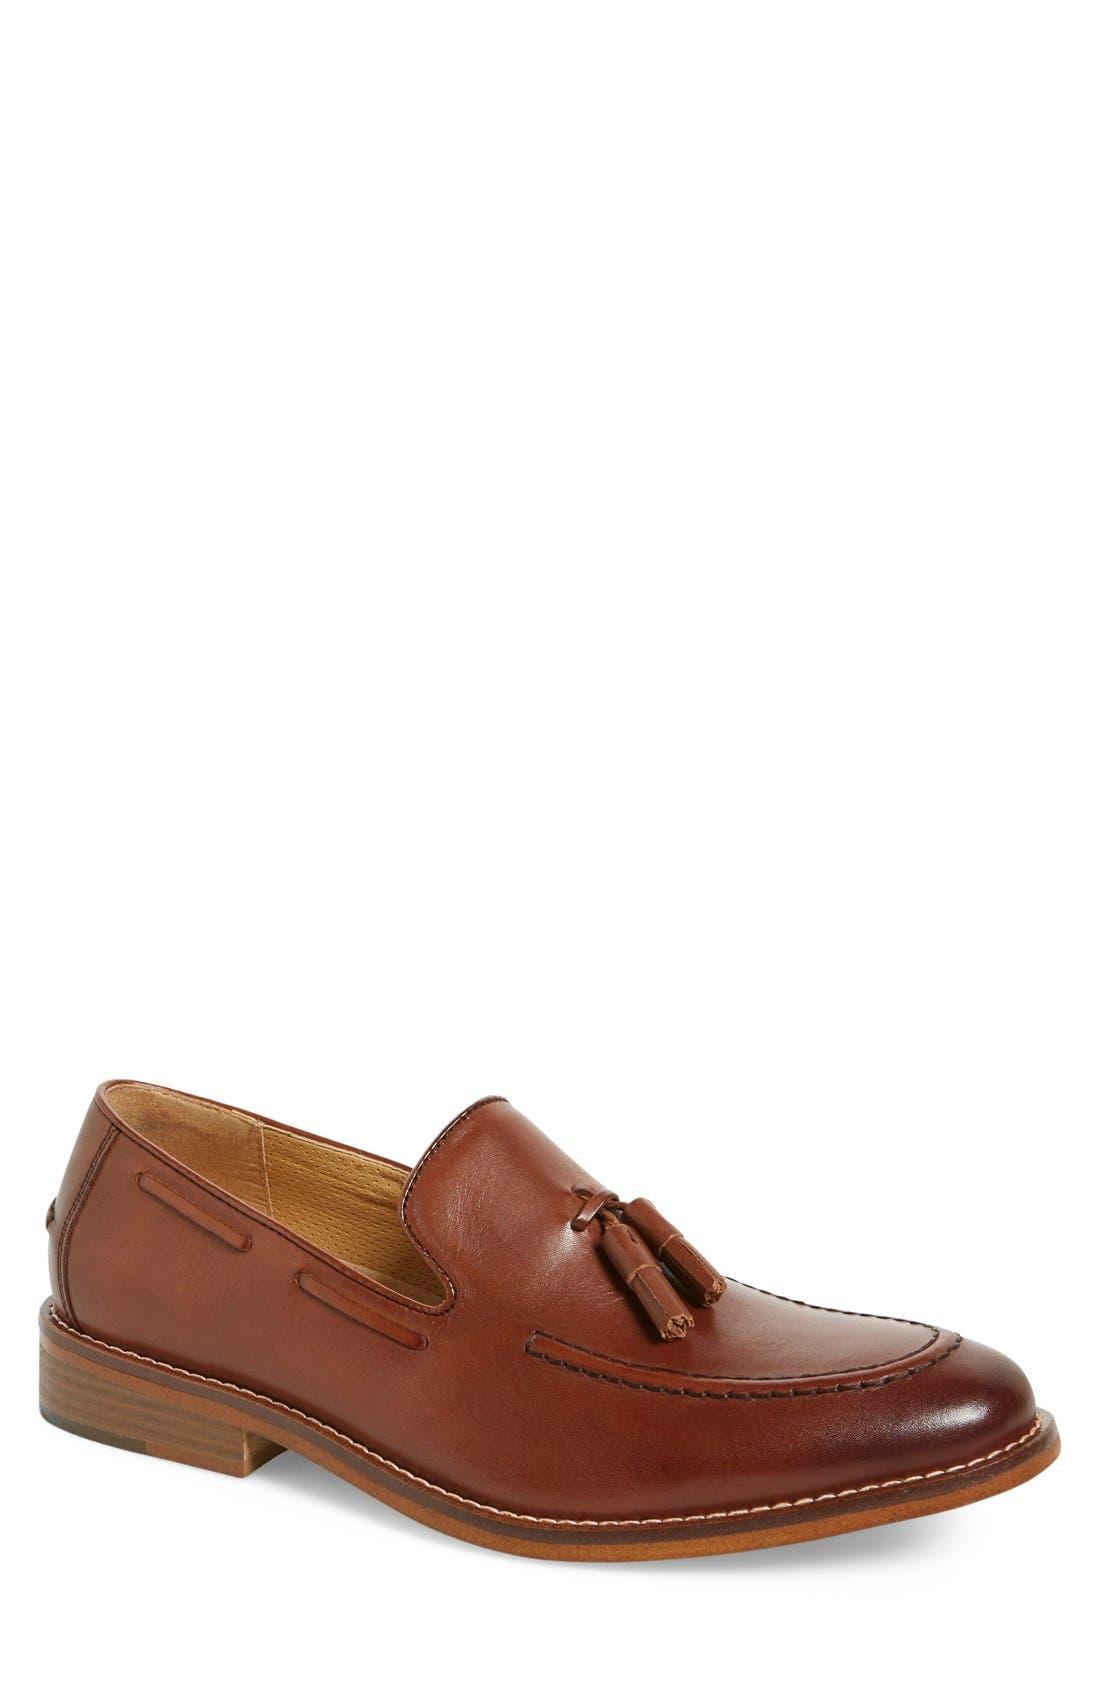 'Cooper' Tassel Loafer,                         Main,                         color, Tan Leather